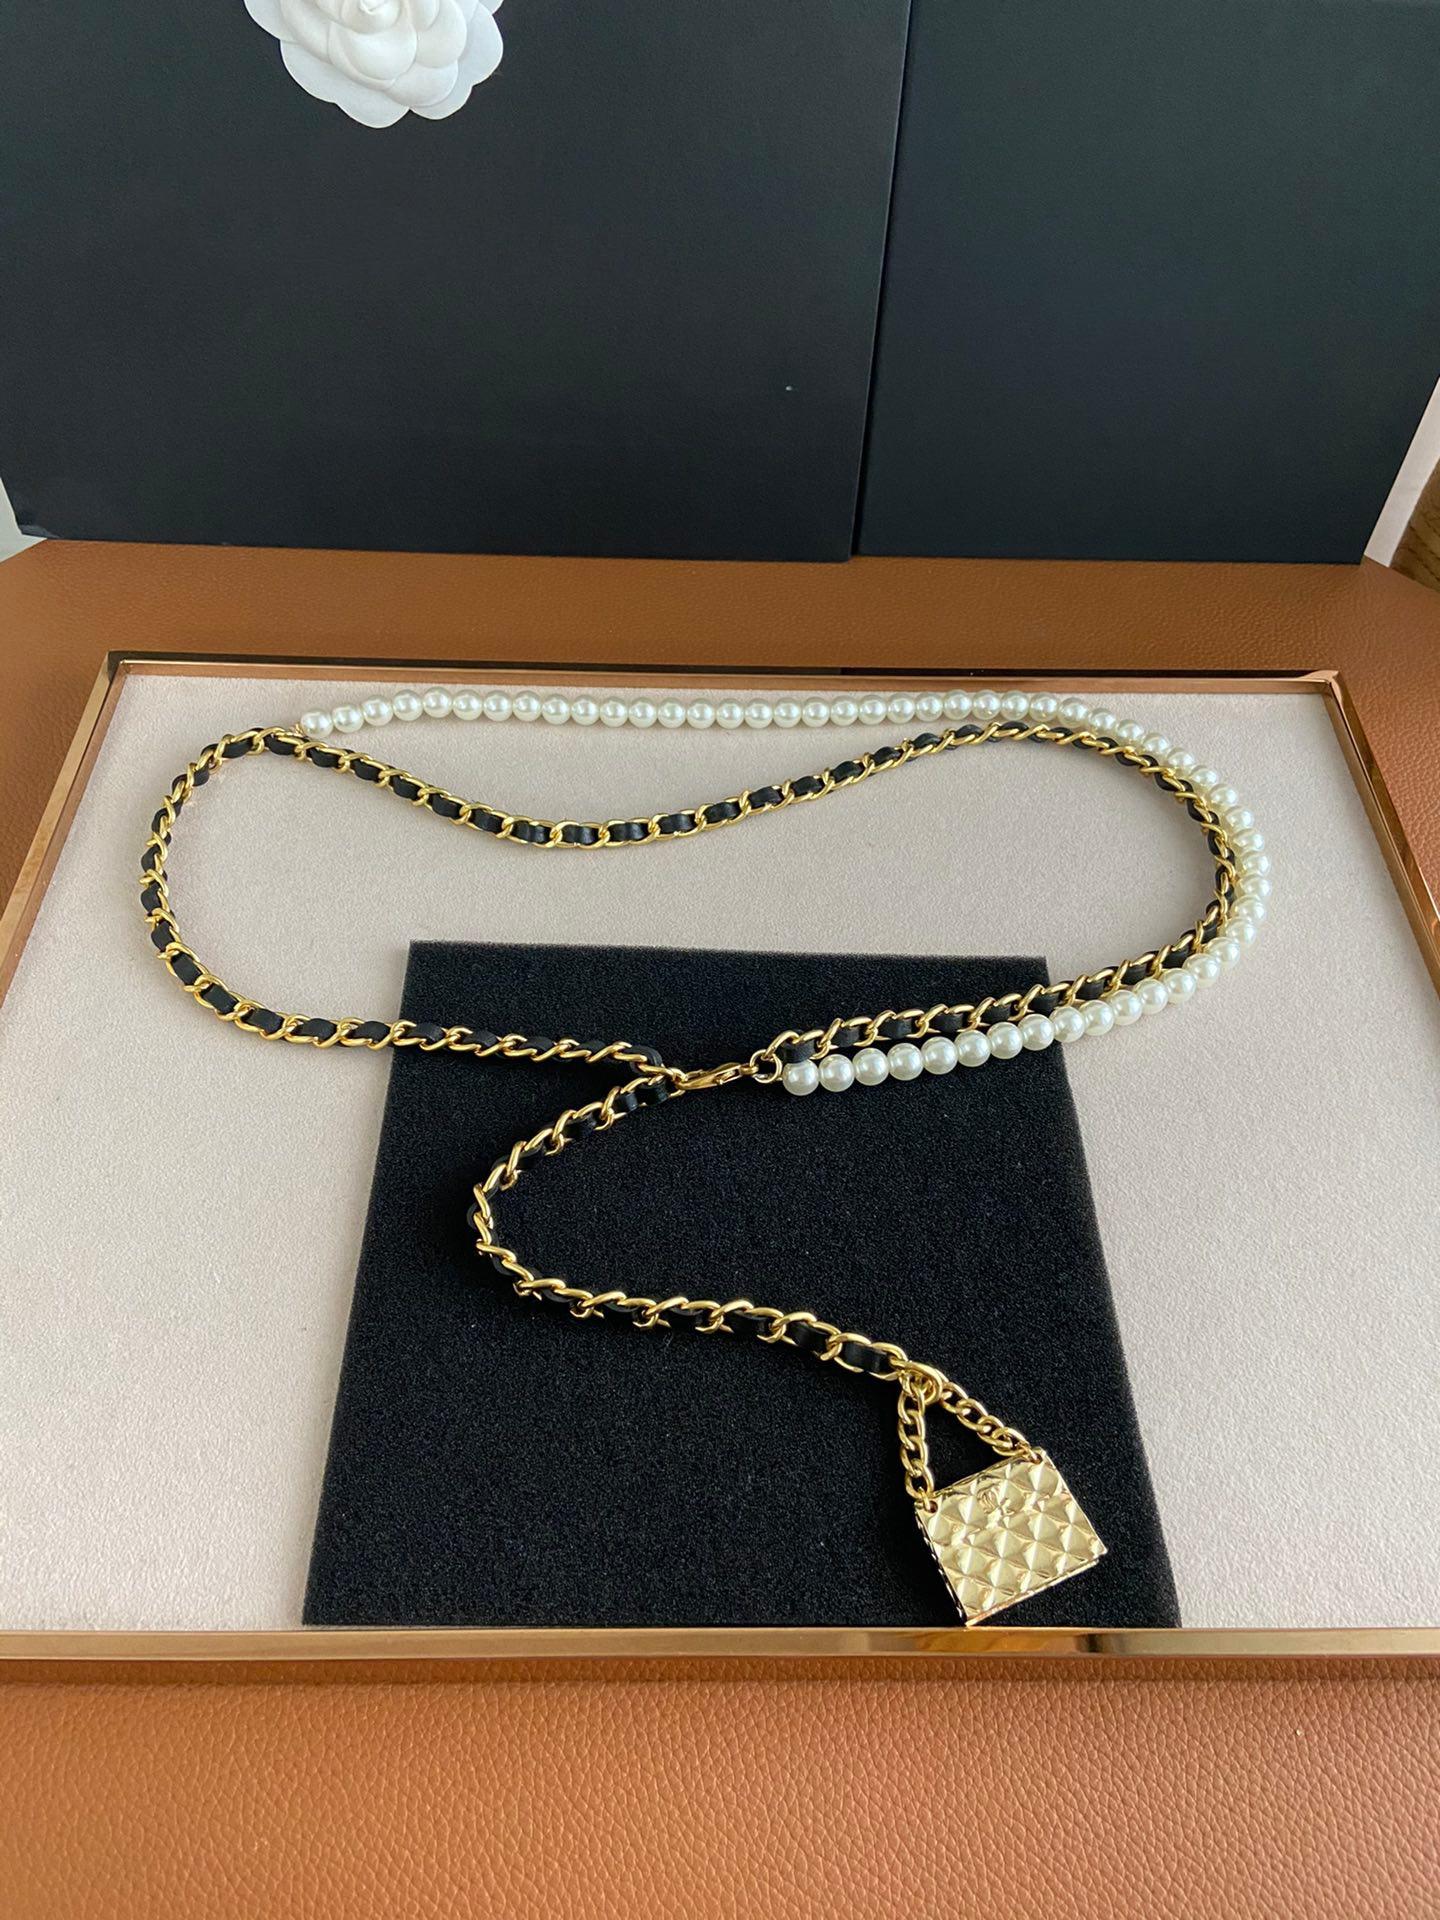 AliExpress - Luxury Designer Female Waist Chain Gold Belt Fashion Pearl Stitching Ceinture Dress Jeans Corset Office 365 Accessories Gifts